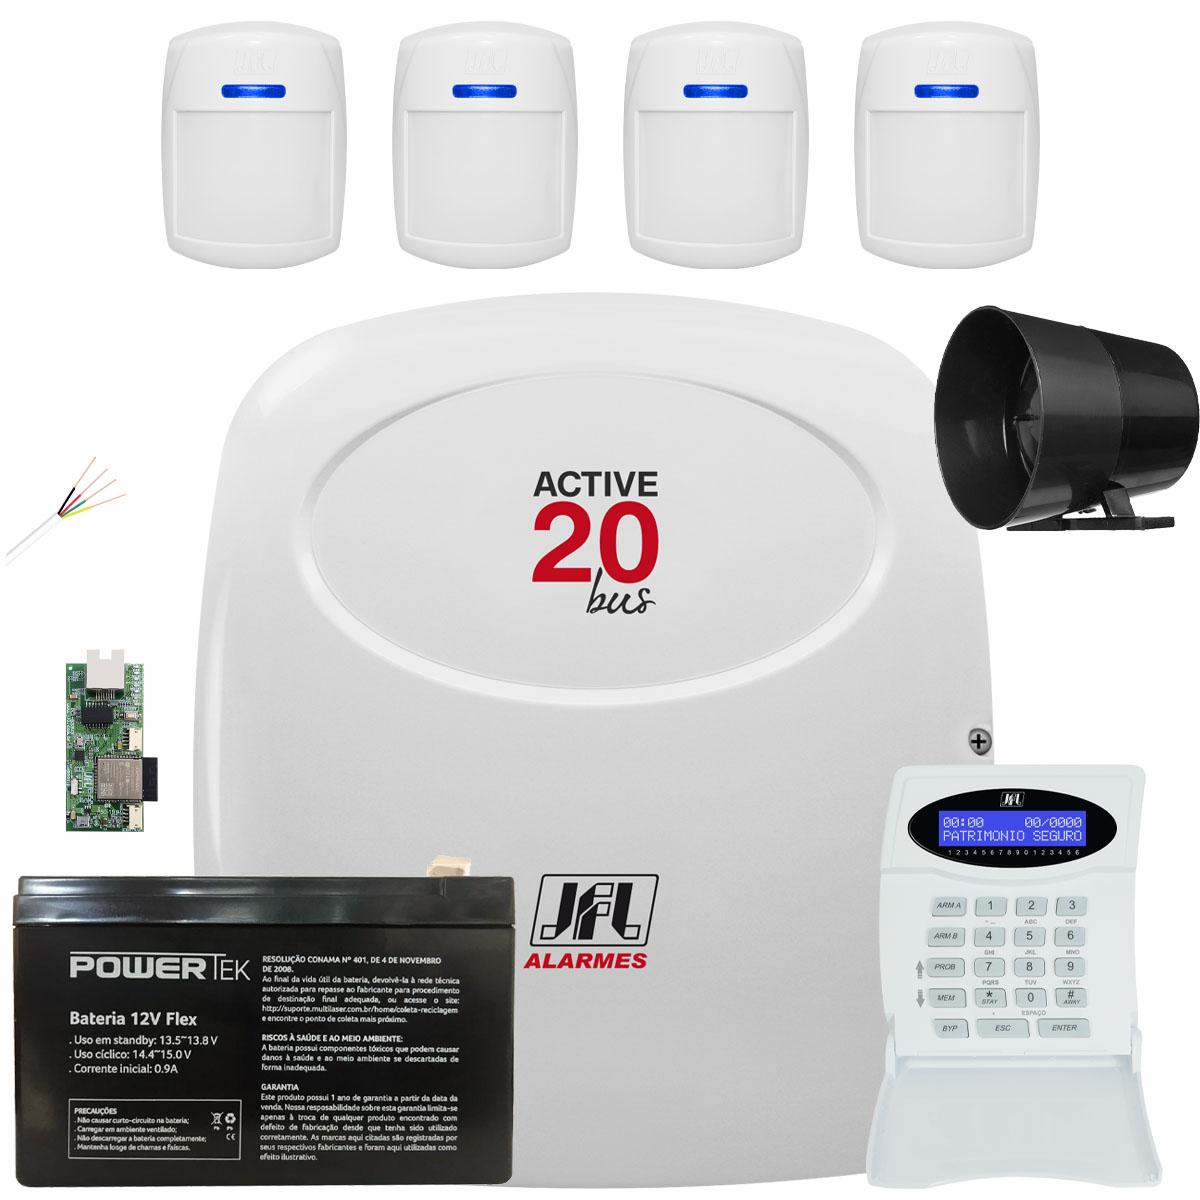 Kit Alarme Monitorado Active 20 Bus Com Sensores 510 Bus Jfl